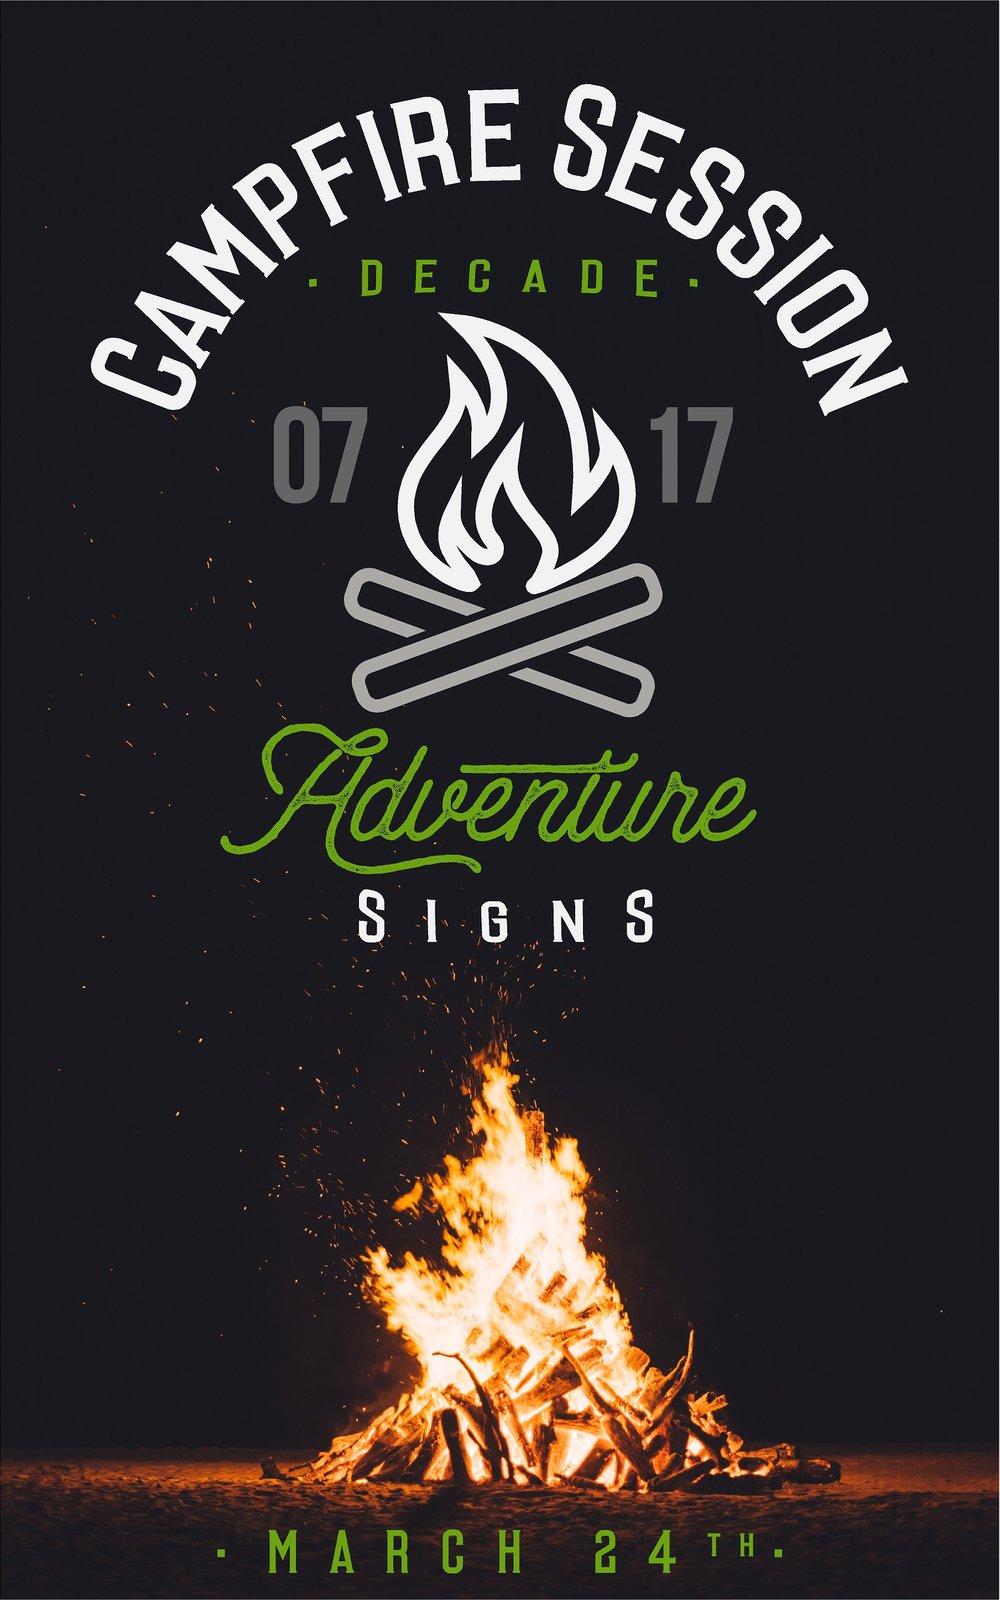 Adenture Decade.campfire.jpg